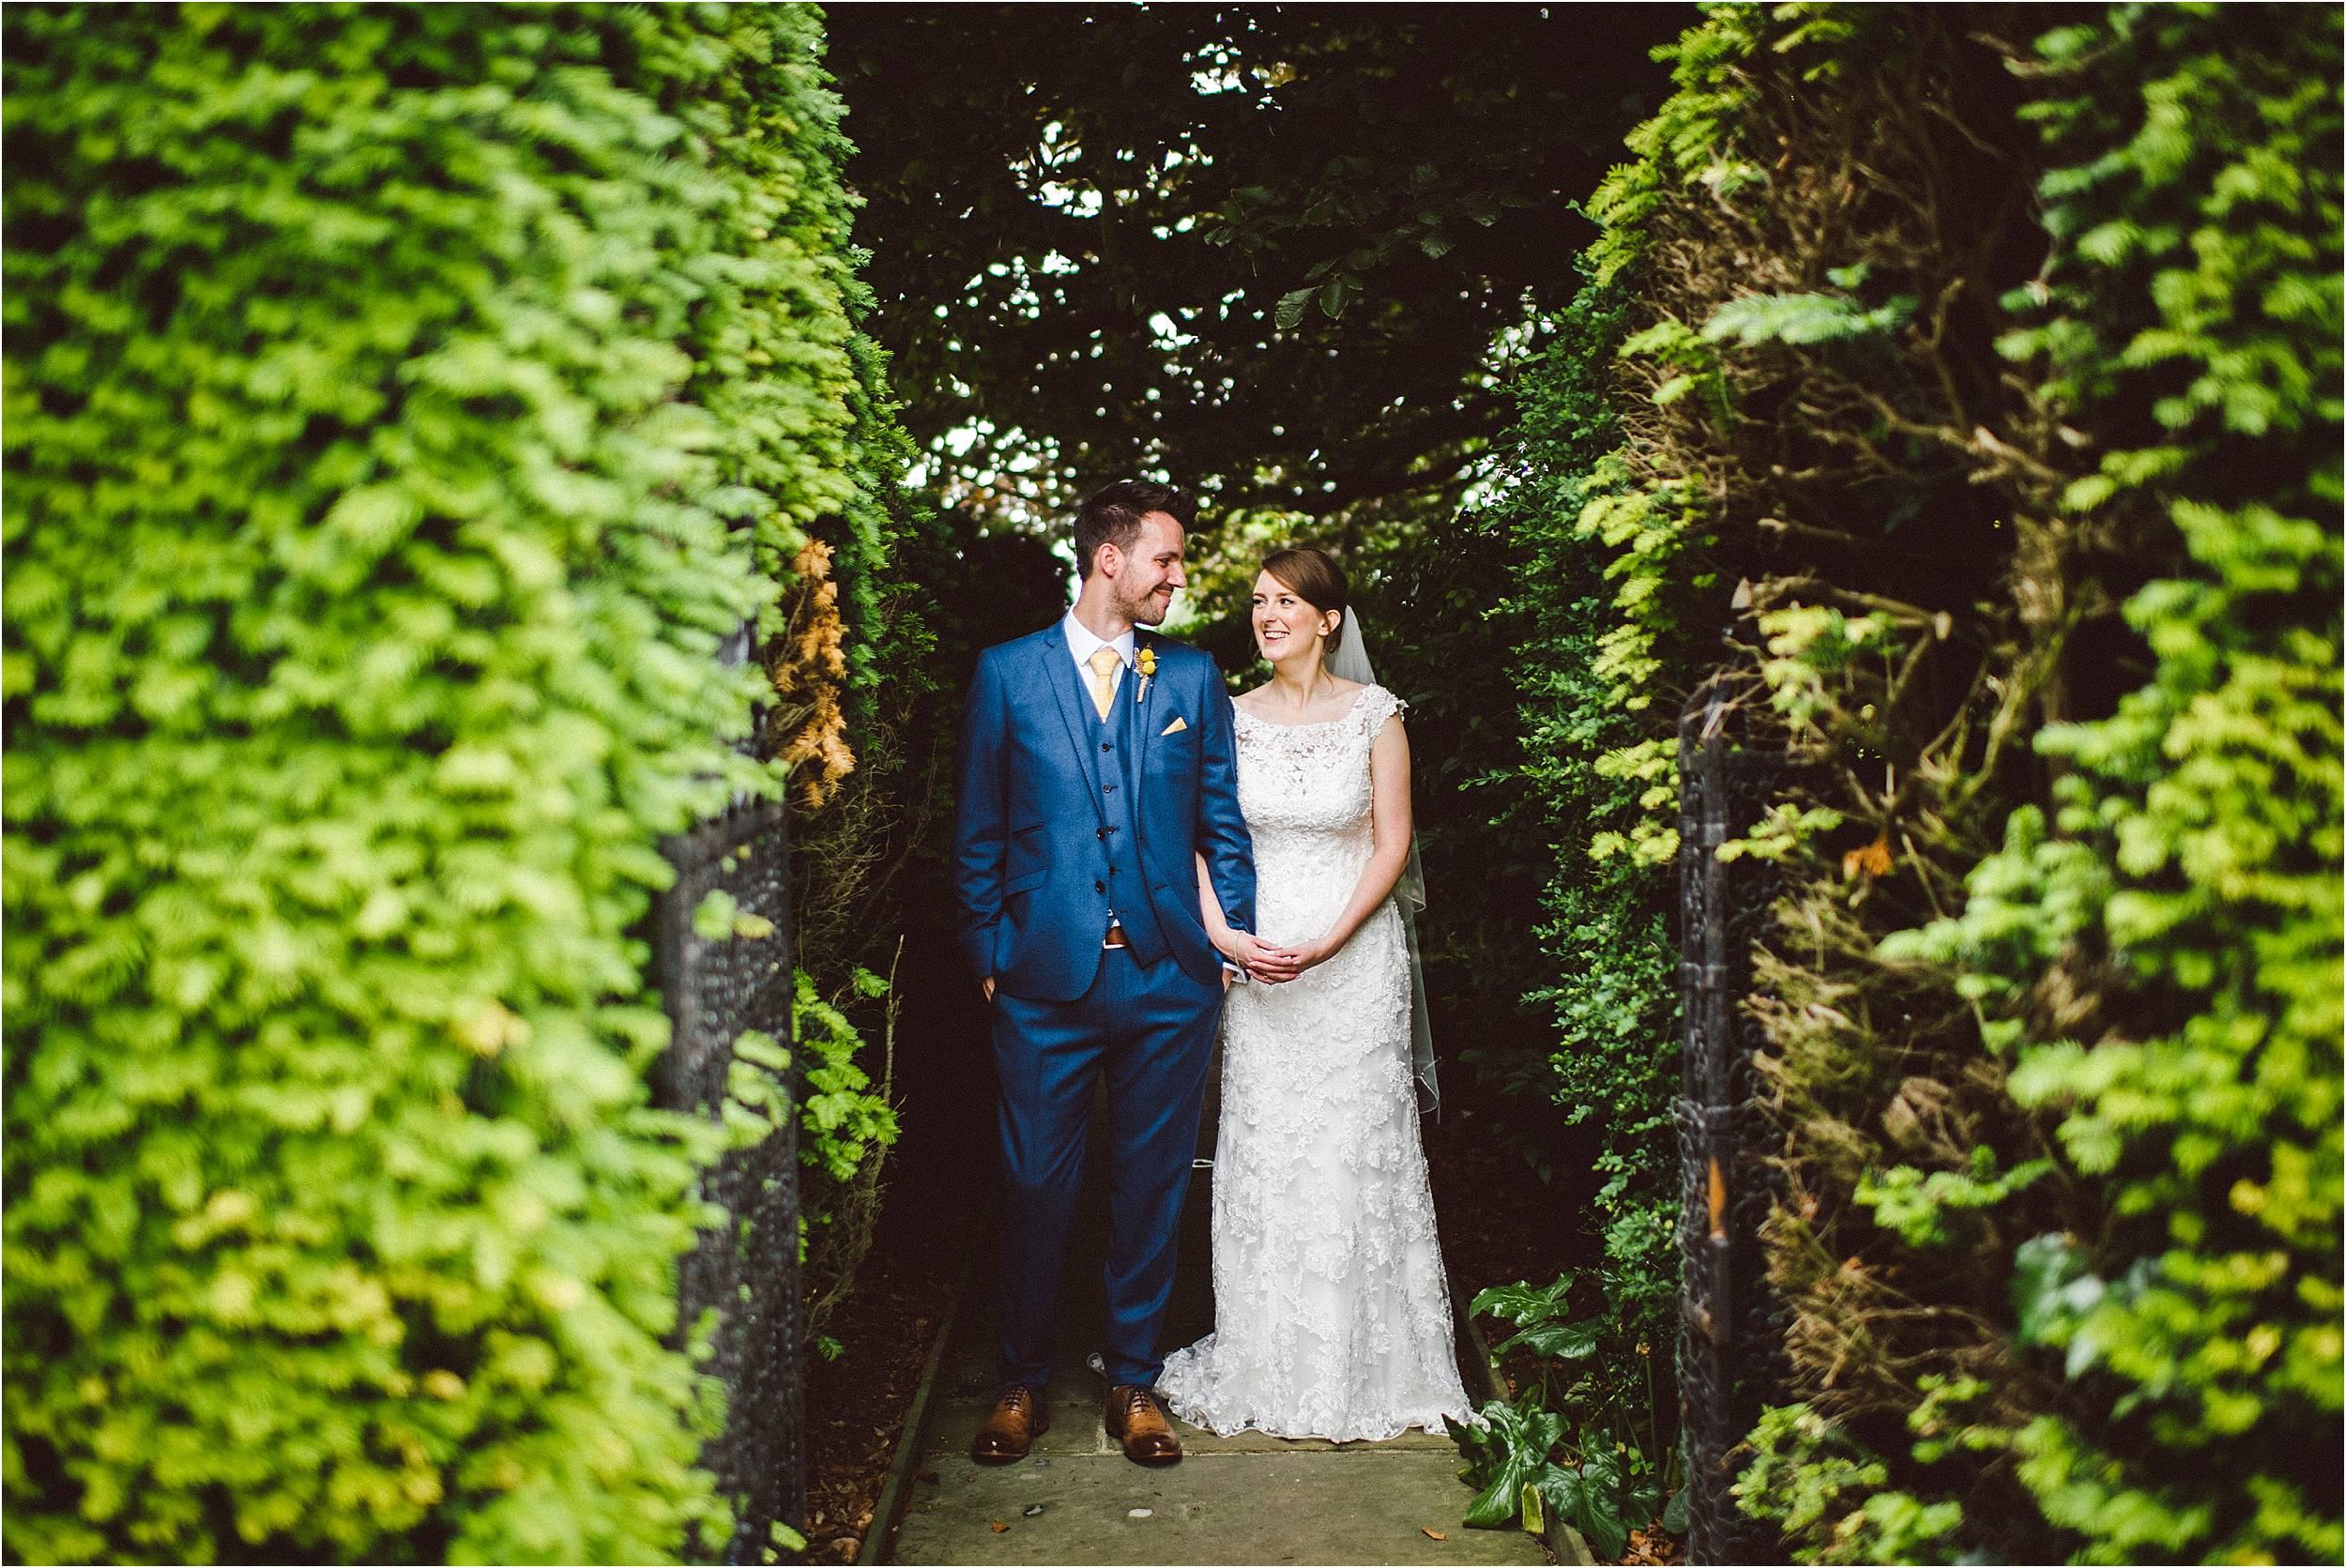 Hengrave Hall Wedding Photographer_0144.jpg